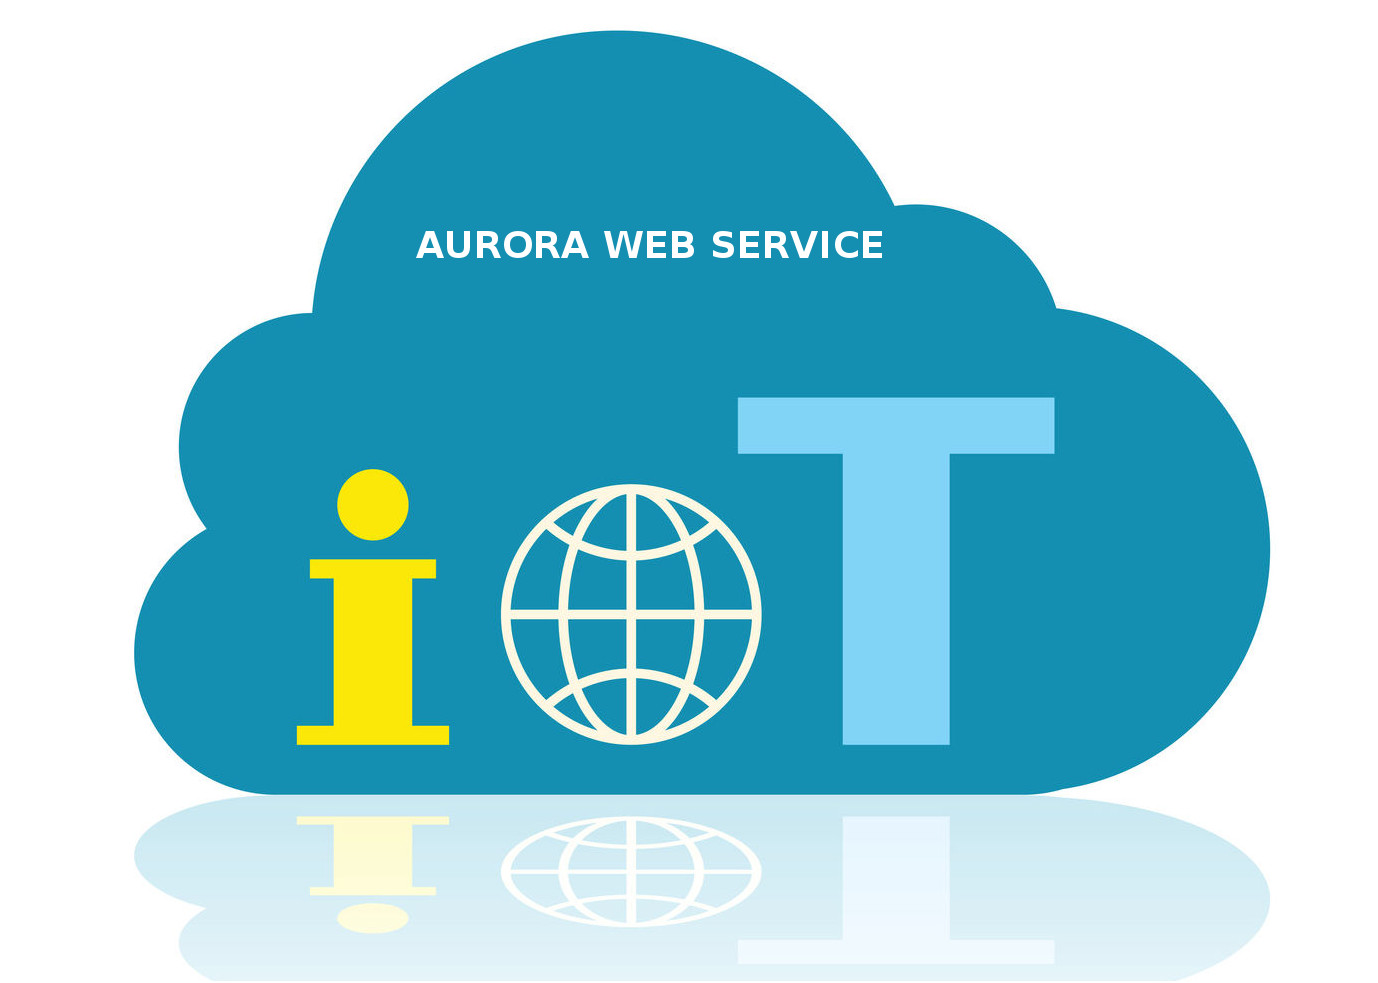 AURORA IOT - WEB SERVICE